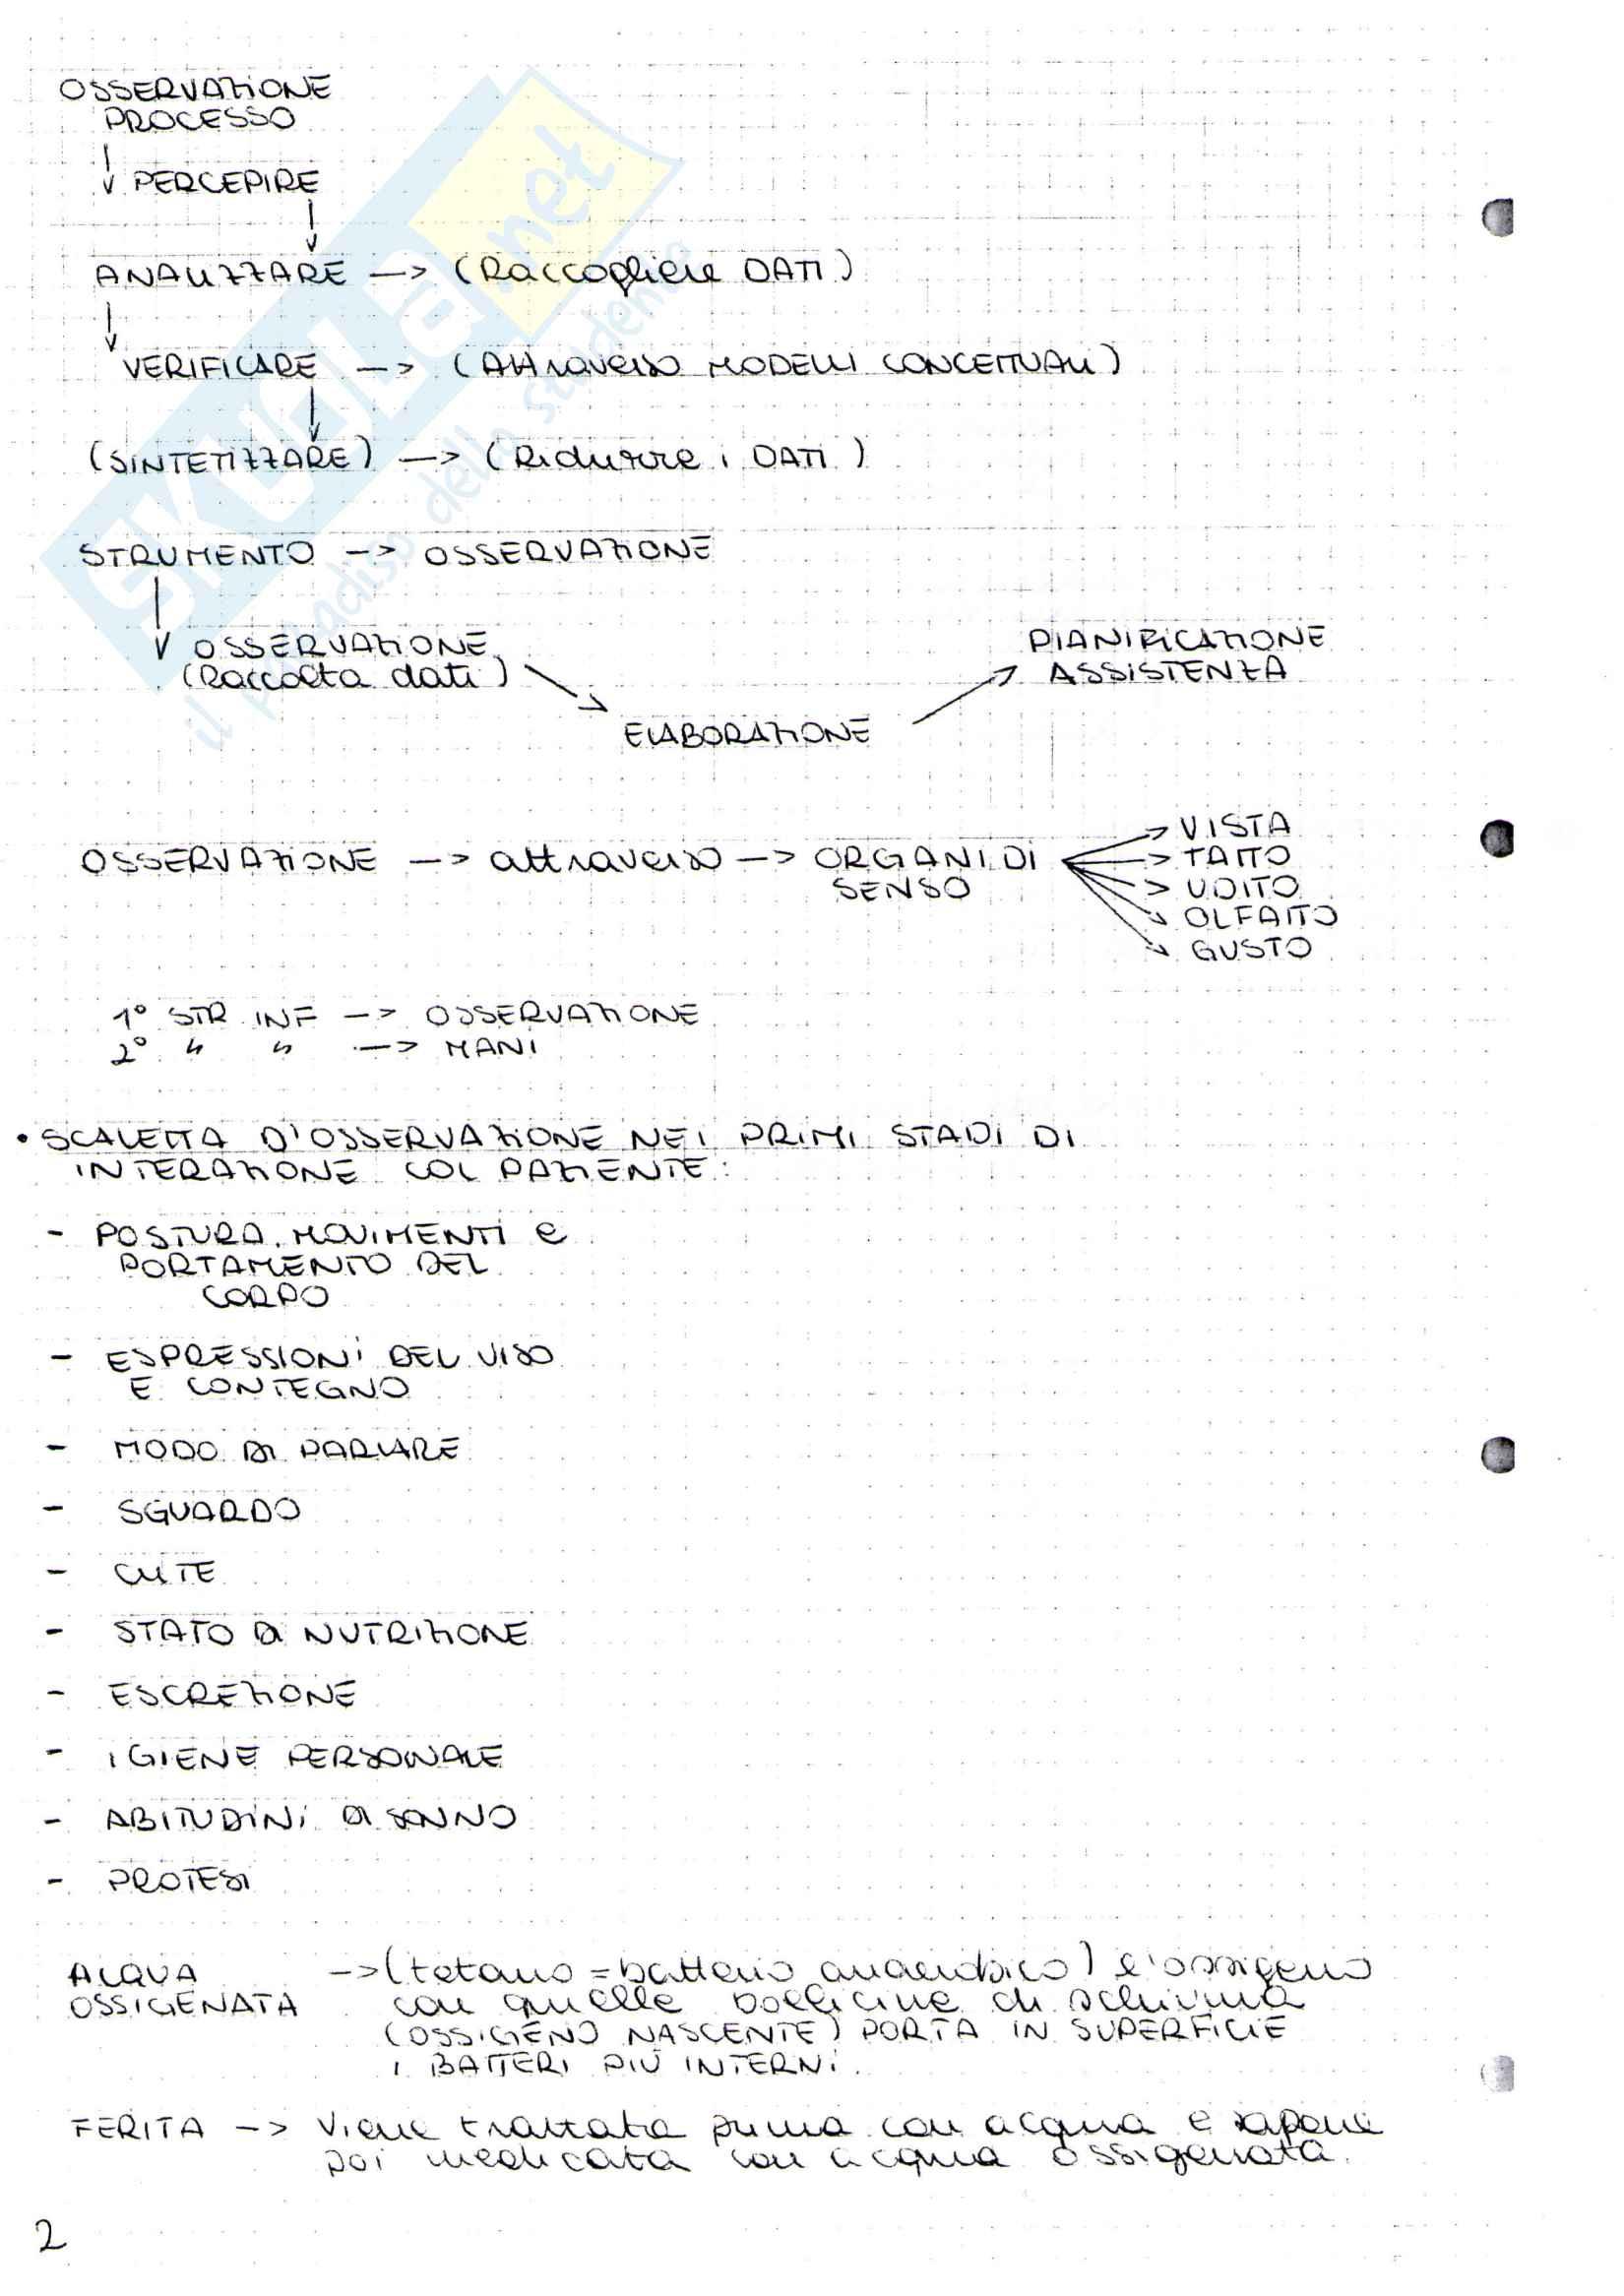 Infermieristica I - Infermieristica clinica Pag. 2